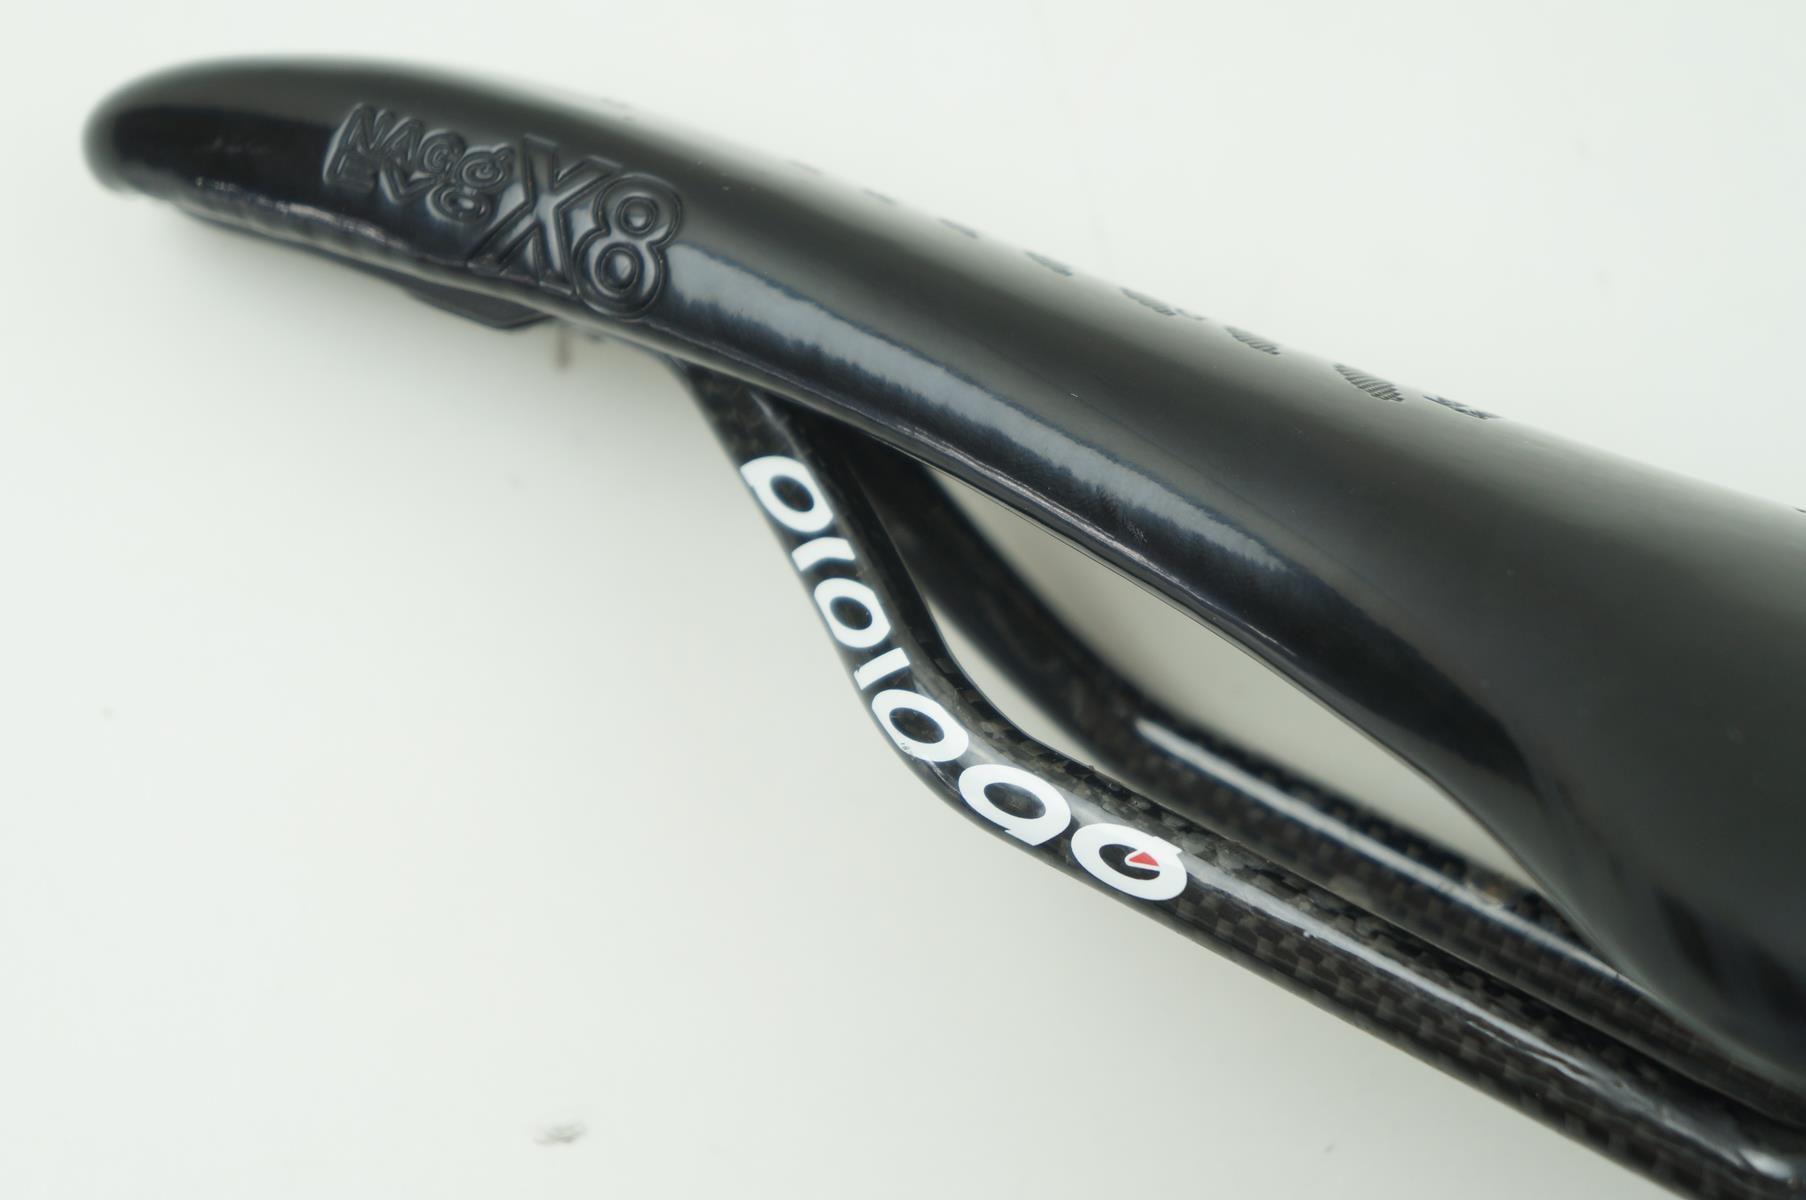 Selim Bicicleta Prologo Nago EVO X8 Nack Preto Para MTB - USADO